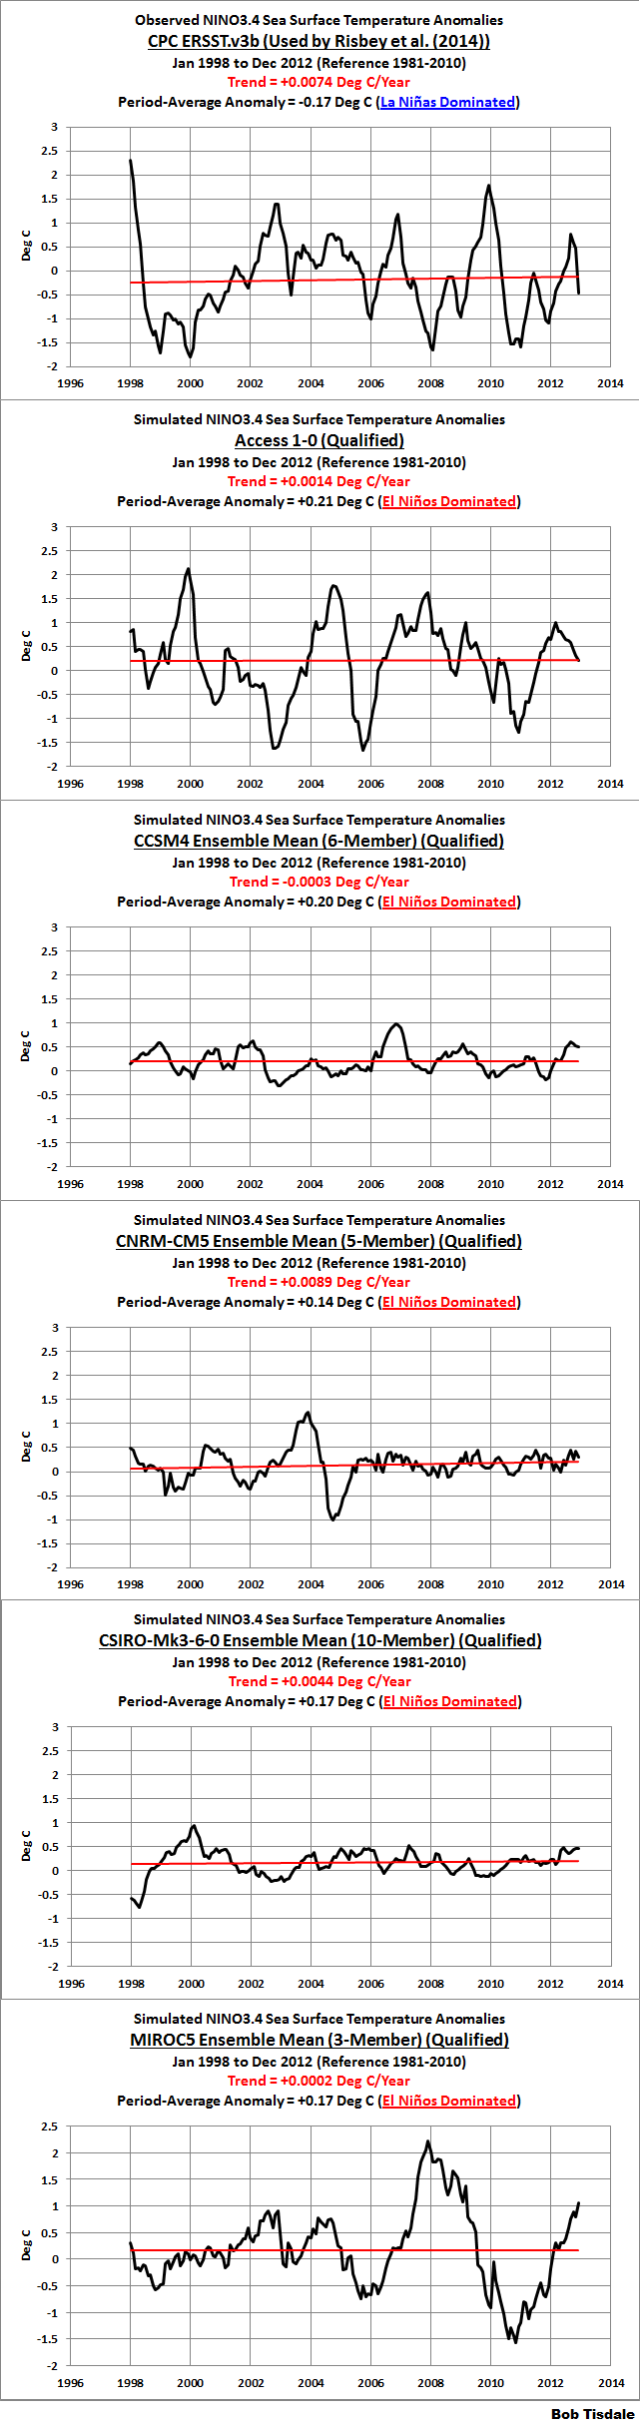 Figure 10 - Model-Data Comparison - Models Used